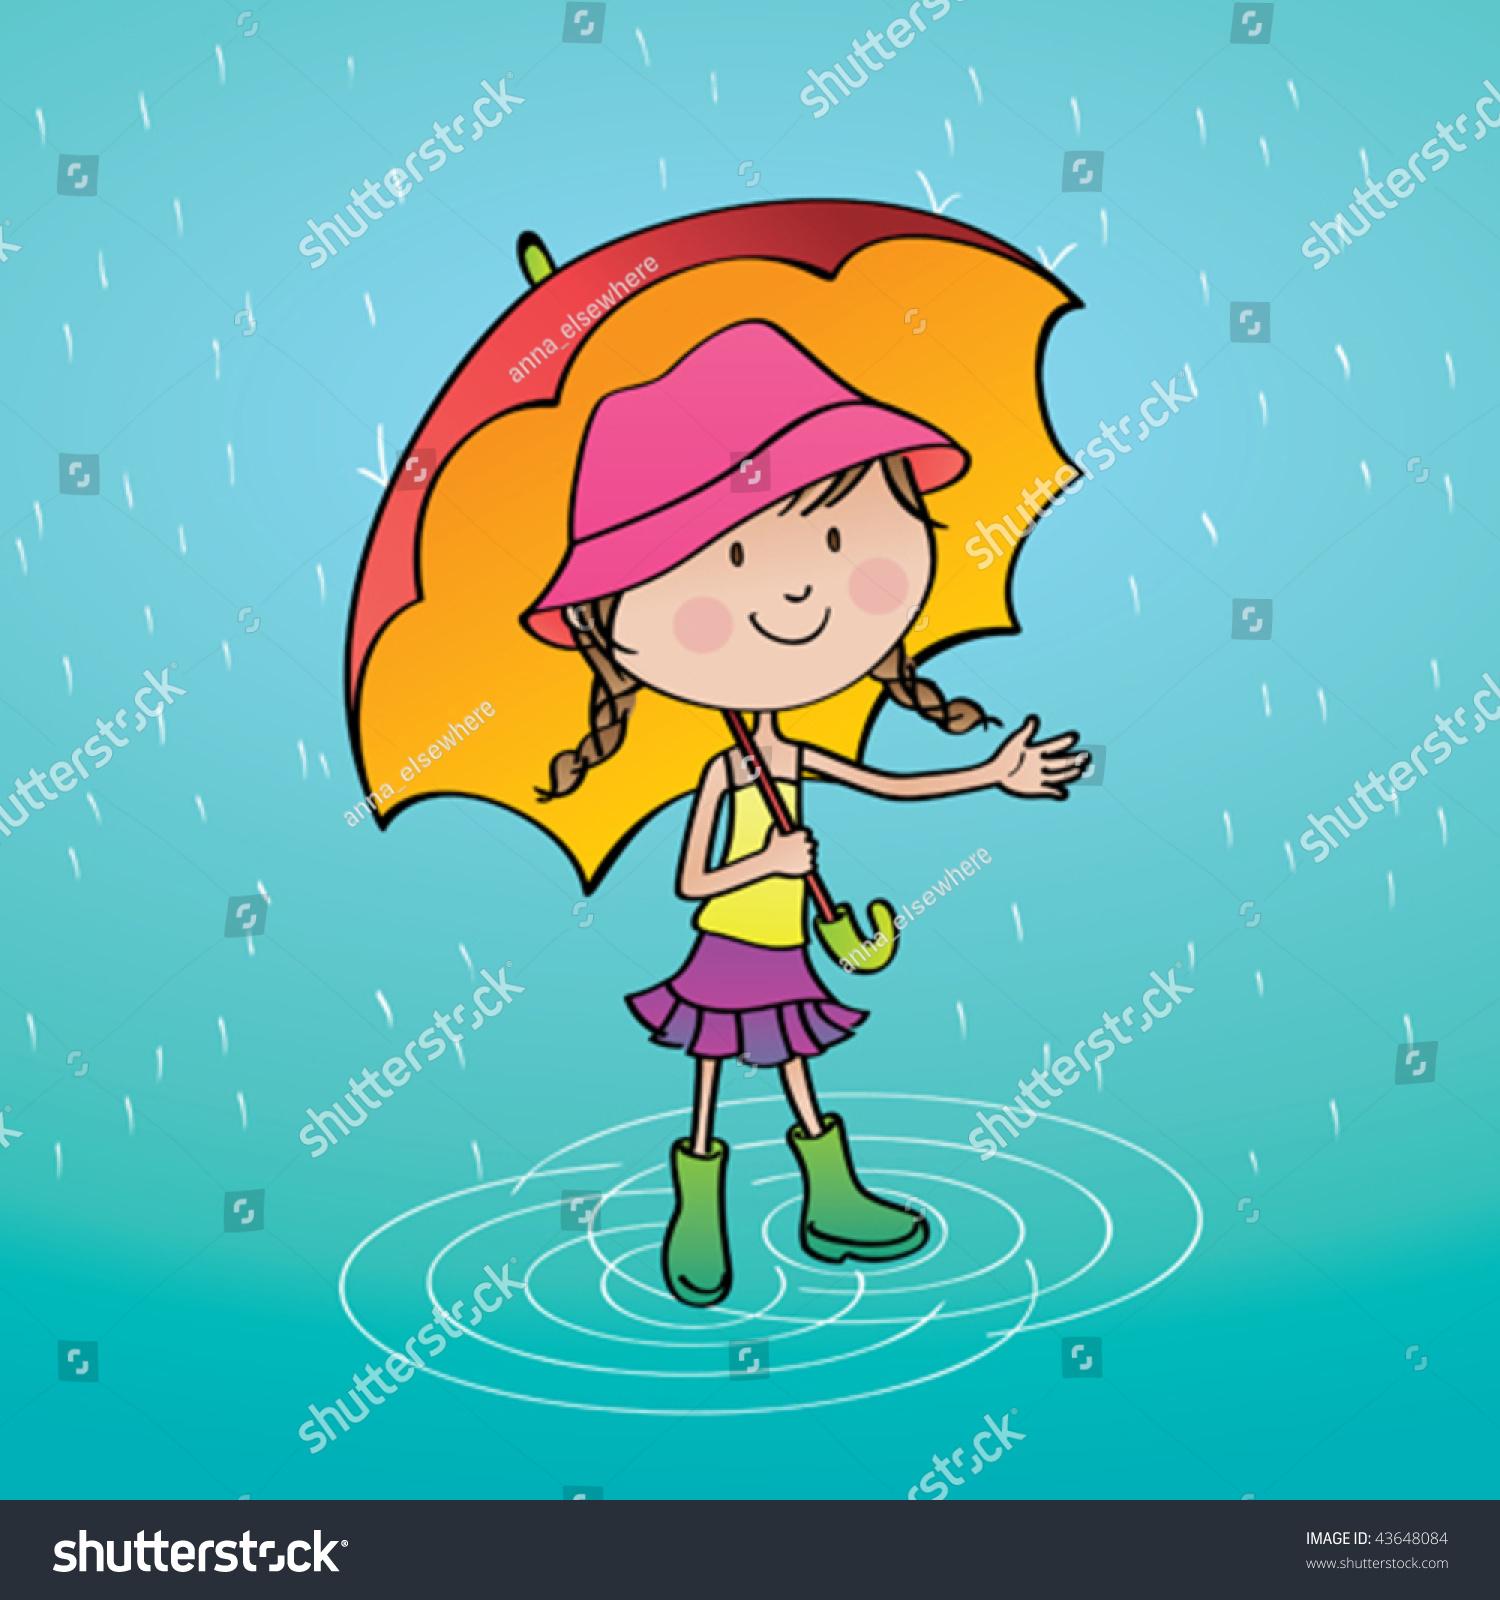 Cute Rainy Day: Summer Rainy Day Vector Illustration Cute Stock Vector